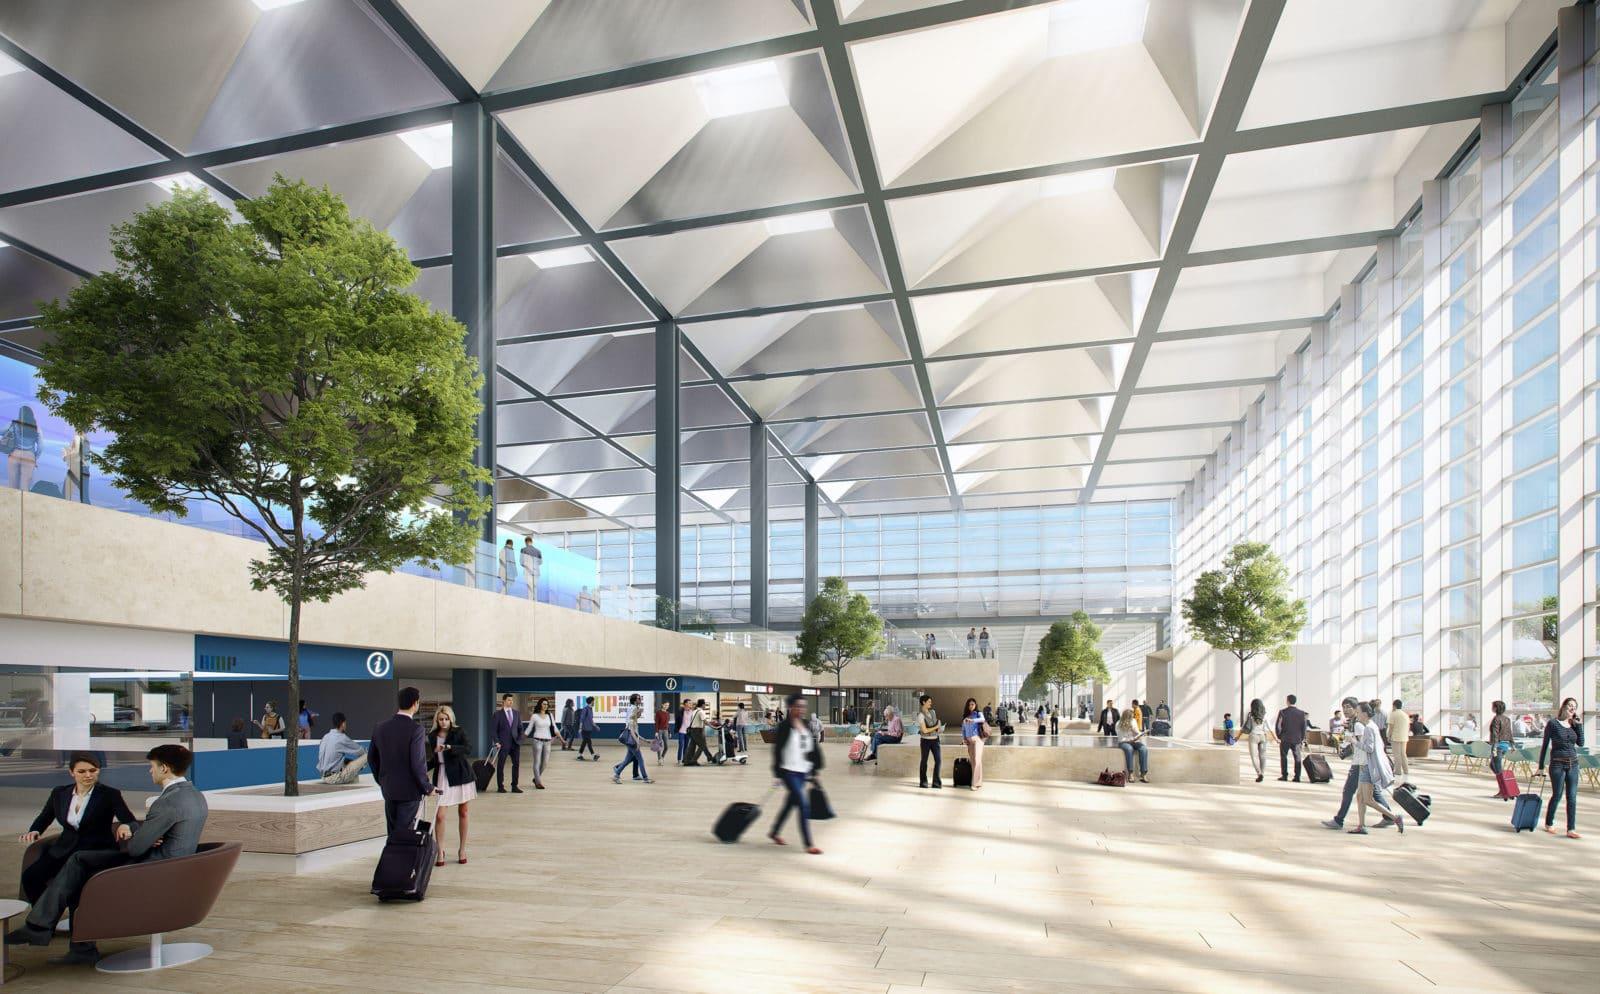 aeroport marseille extension foster 7